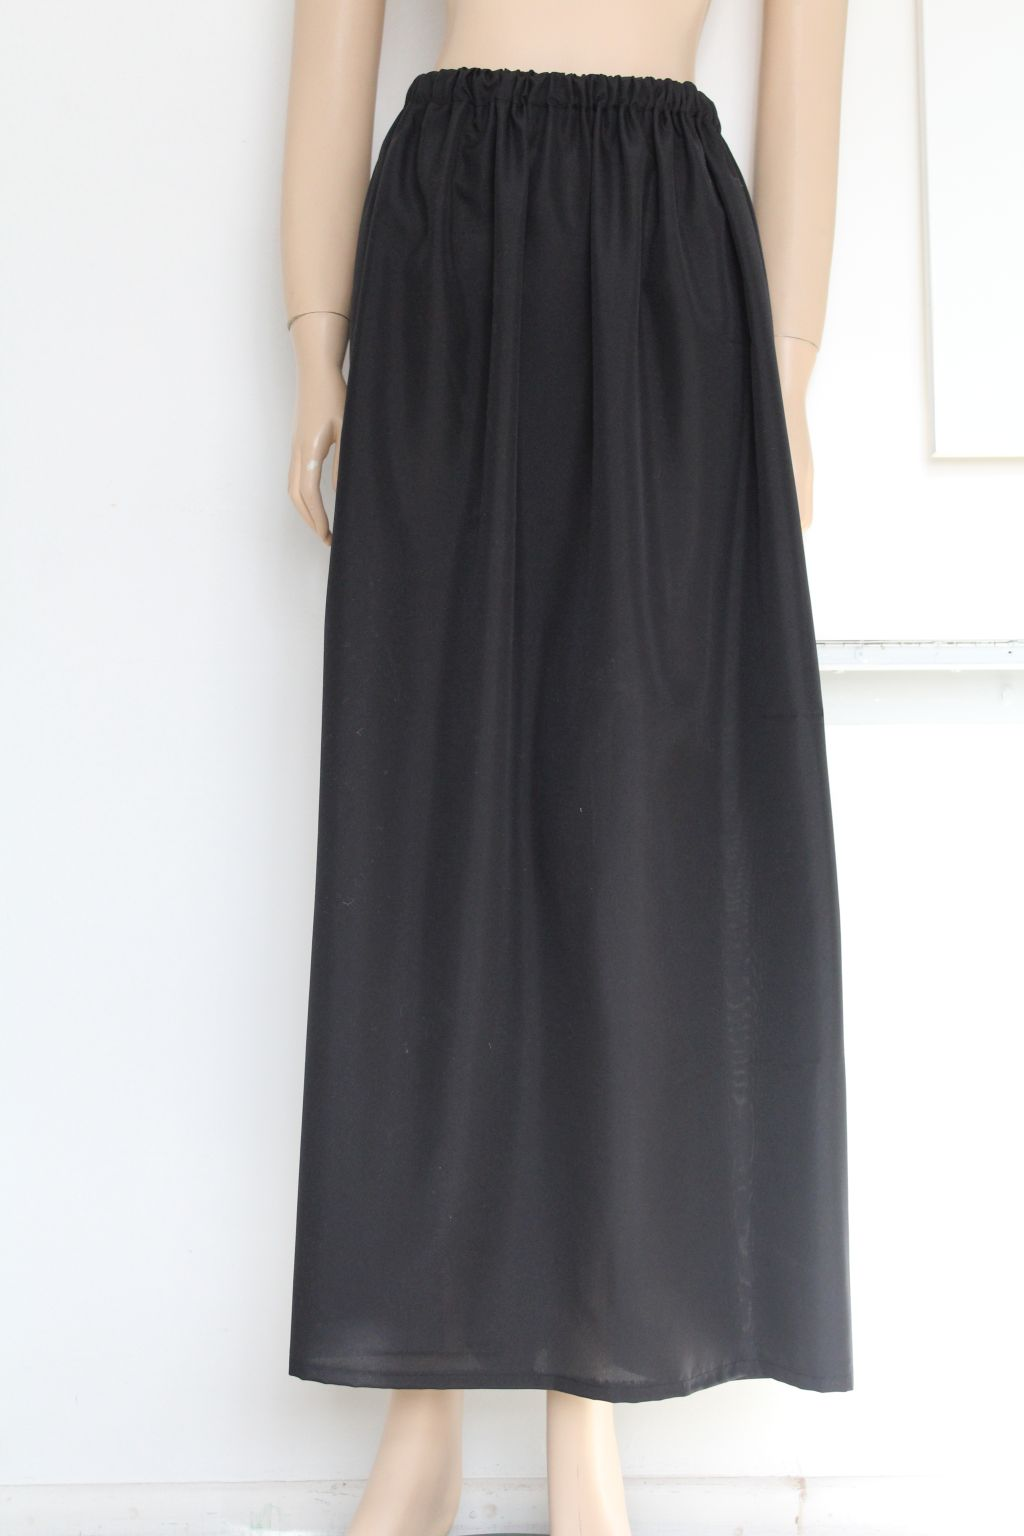 Skirts - Greenie Dresses For Less